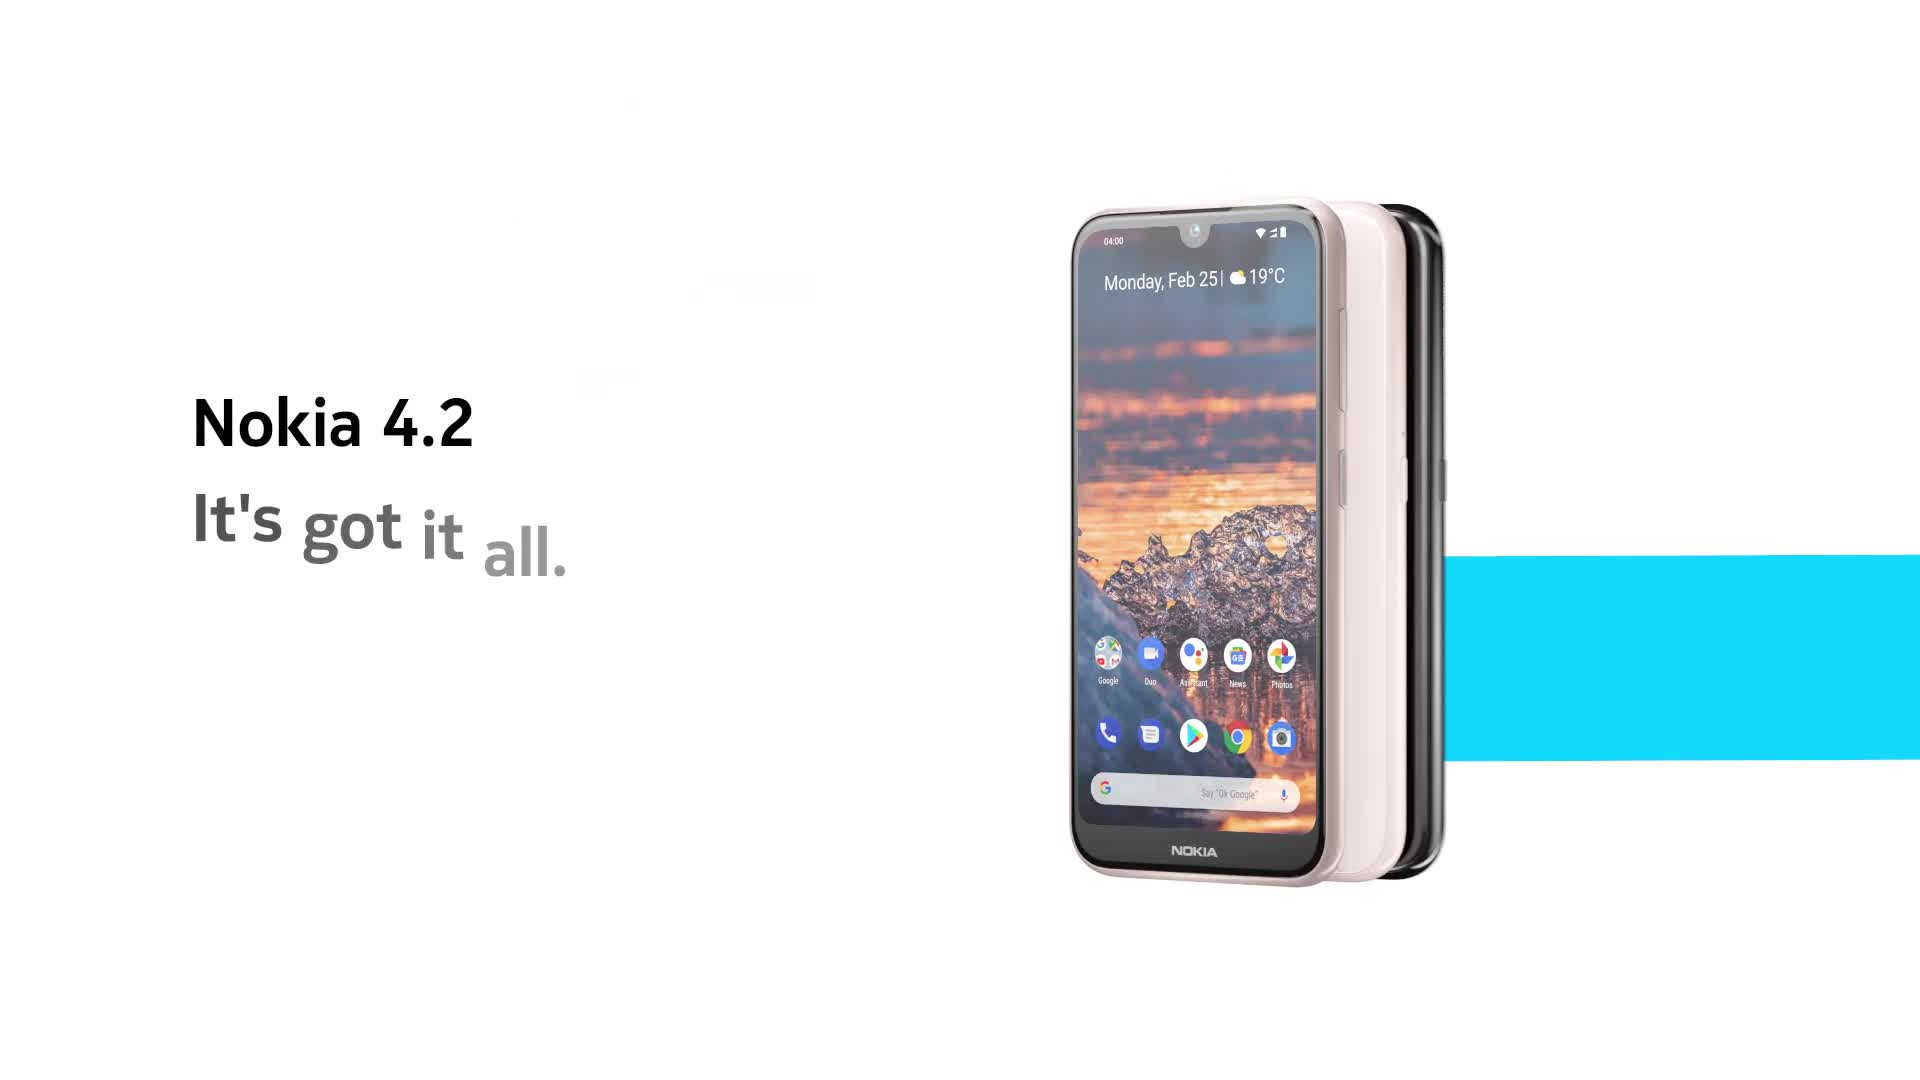 Smartphone, Nokia, Mwc, Mobile World Congress, MWC 2019, Mobile World Congress 2019, Nokia 4.2